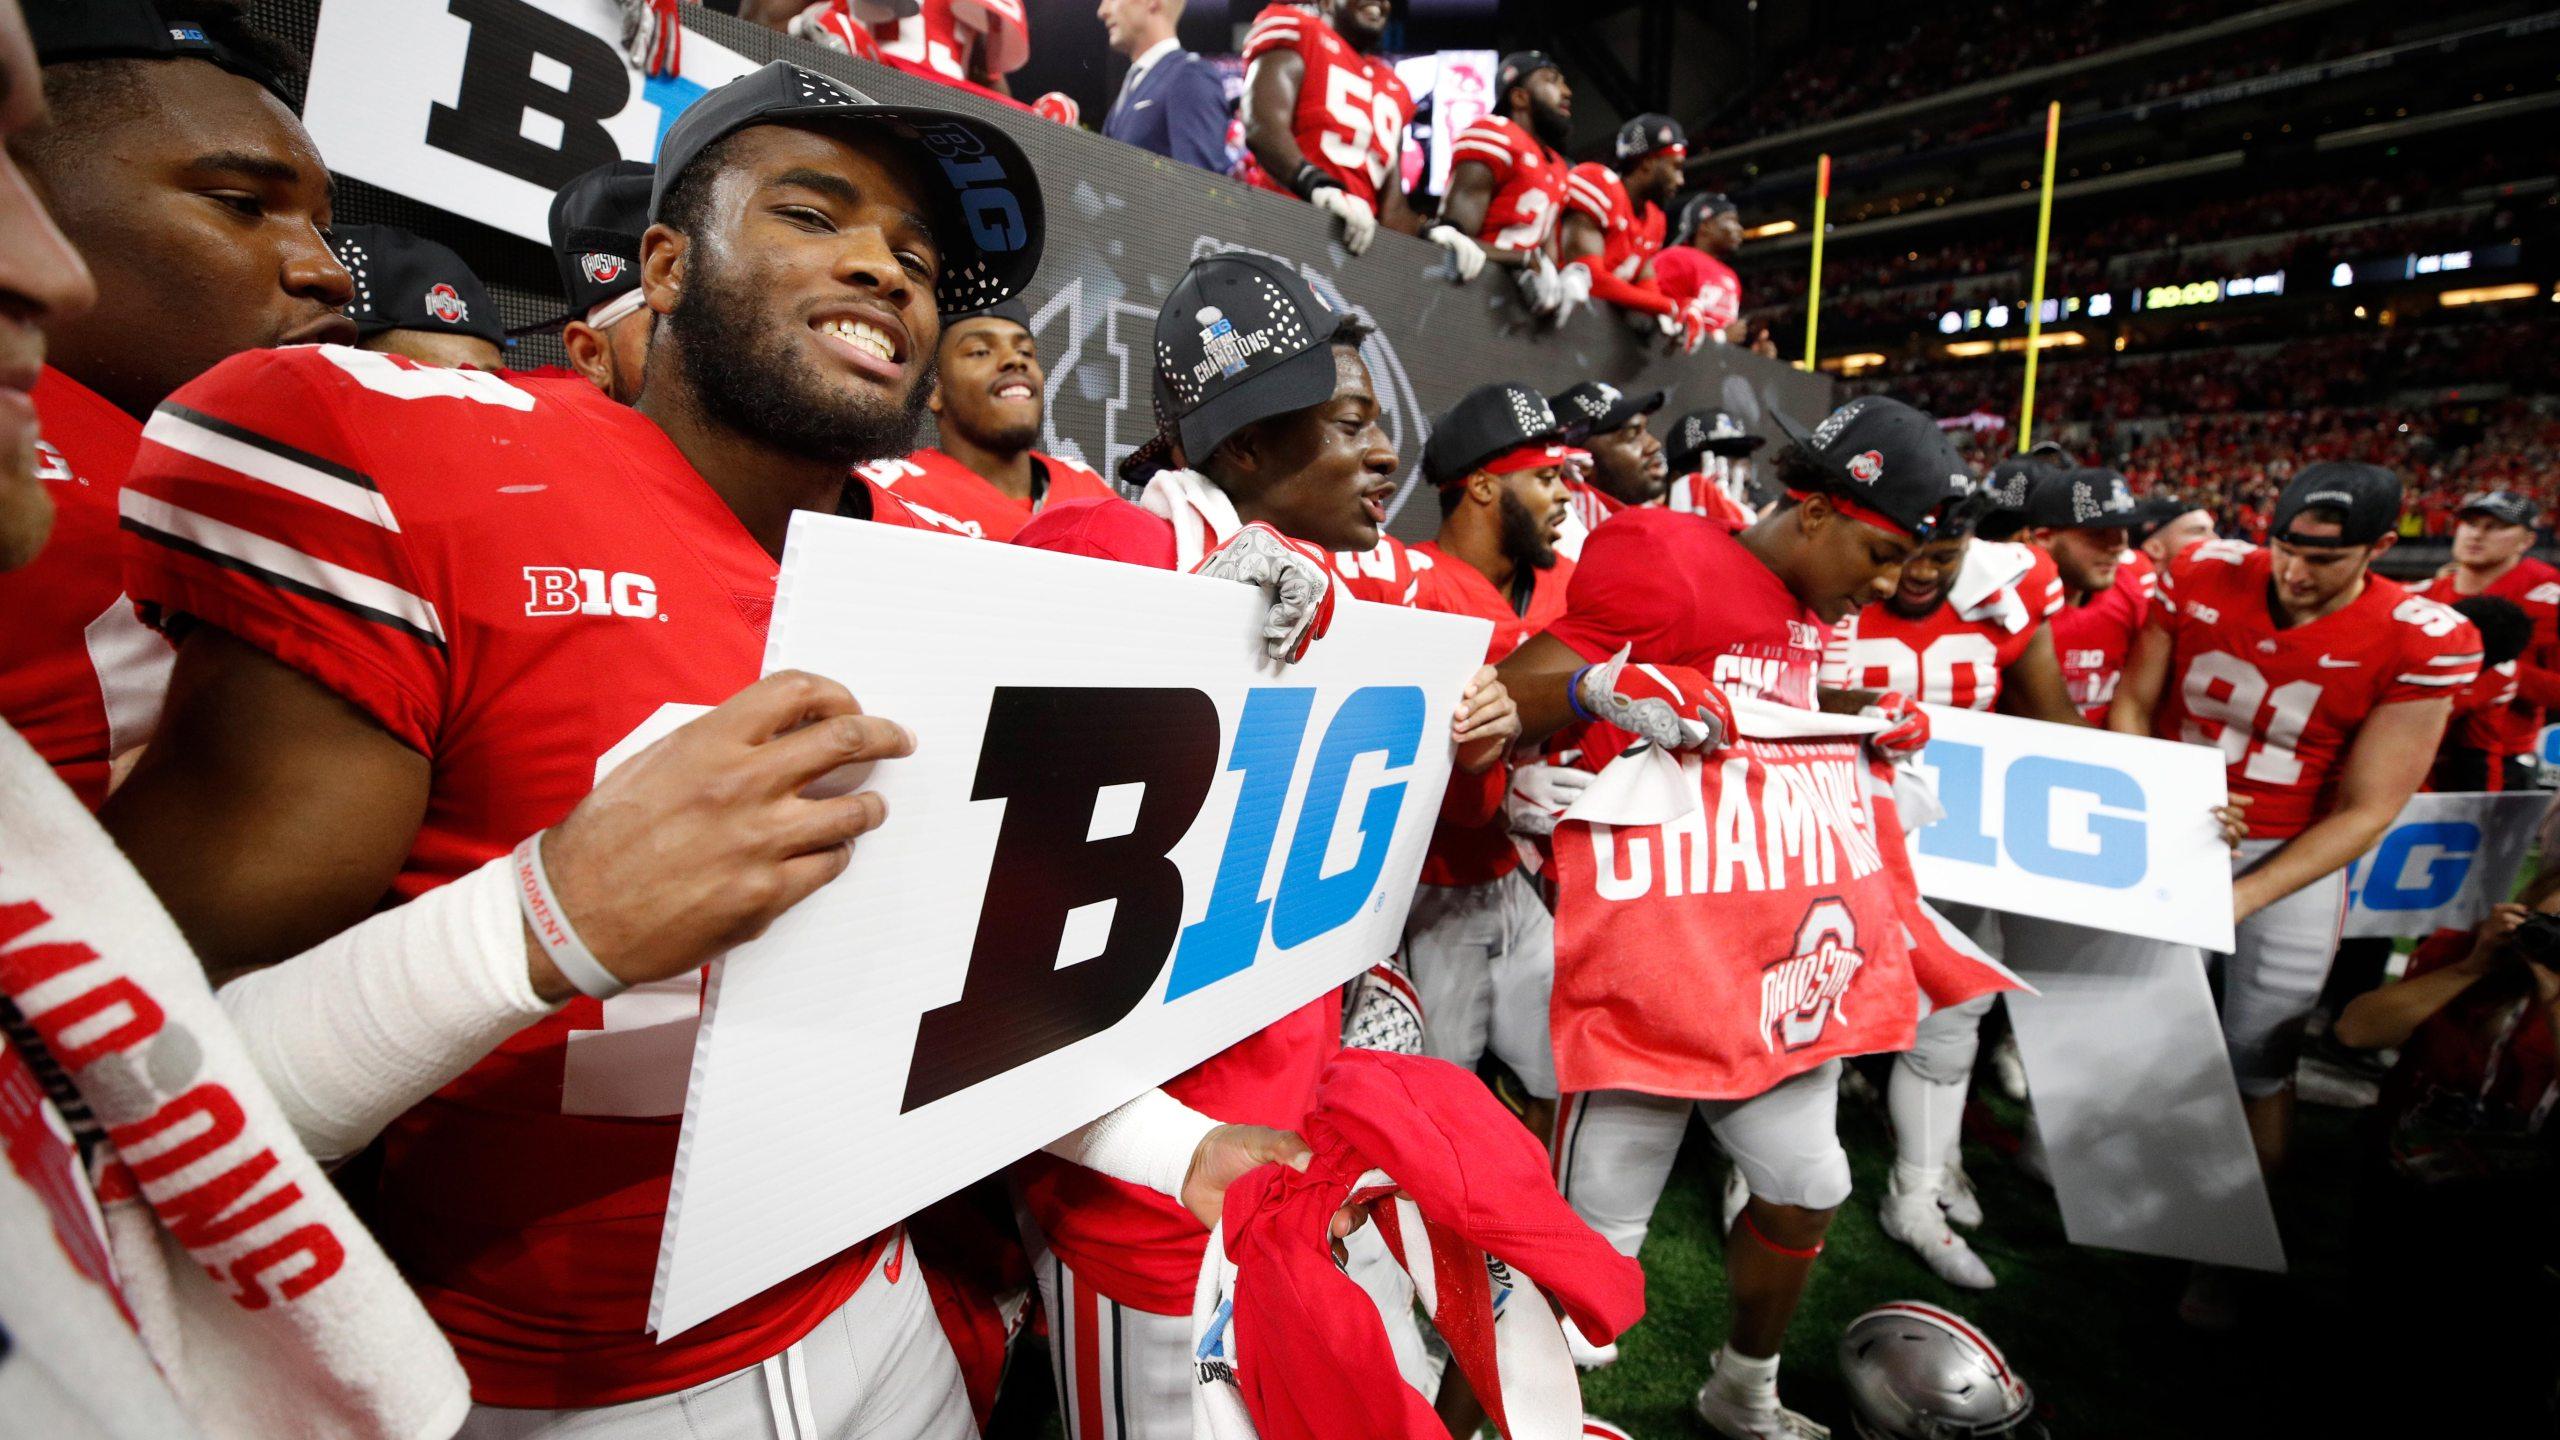 GettyImages-1075847034 ohio state buckeyes big 10 championship1_1545925965988.jpg.jpg